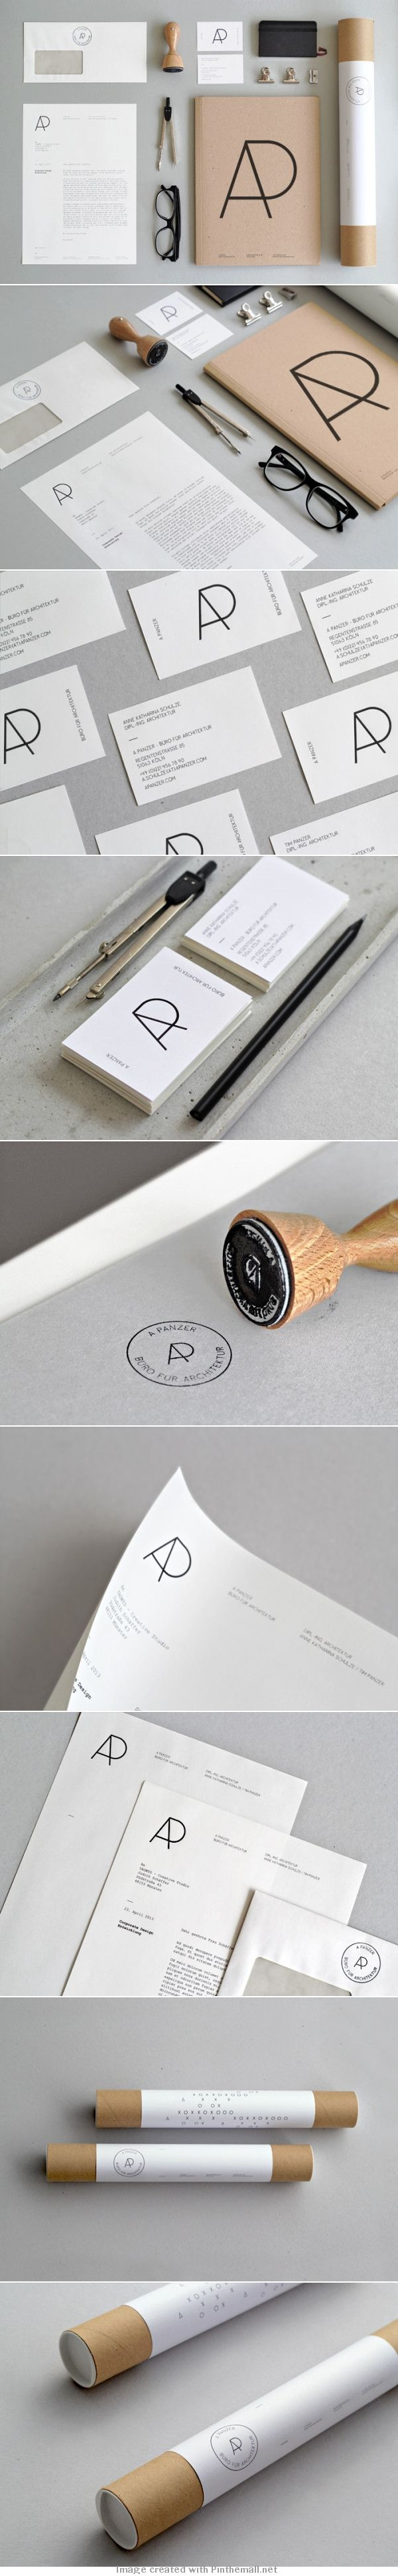 Ref: Os tons, o grafismo, o modelo do papel de carta